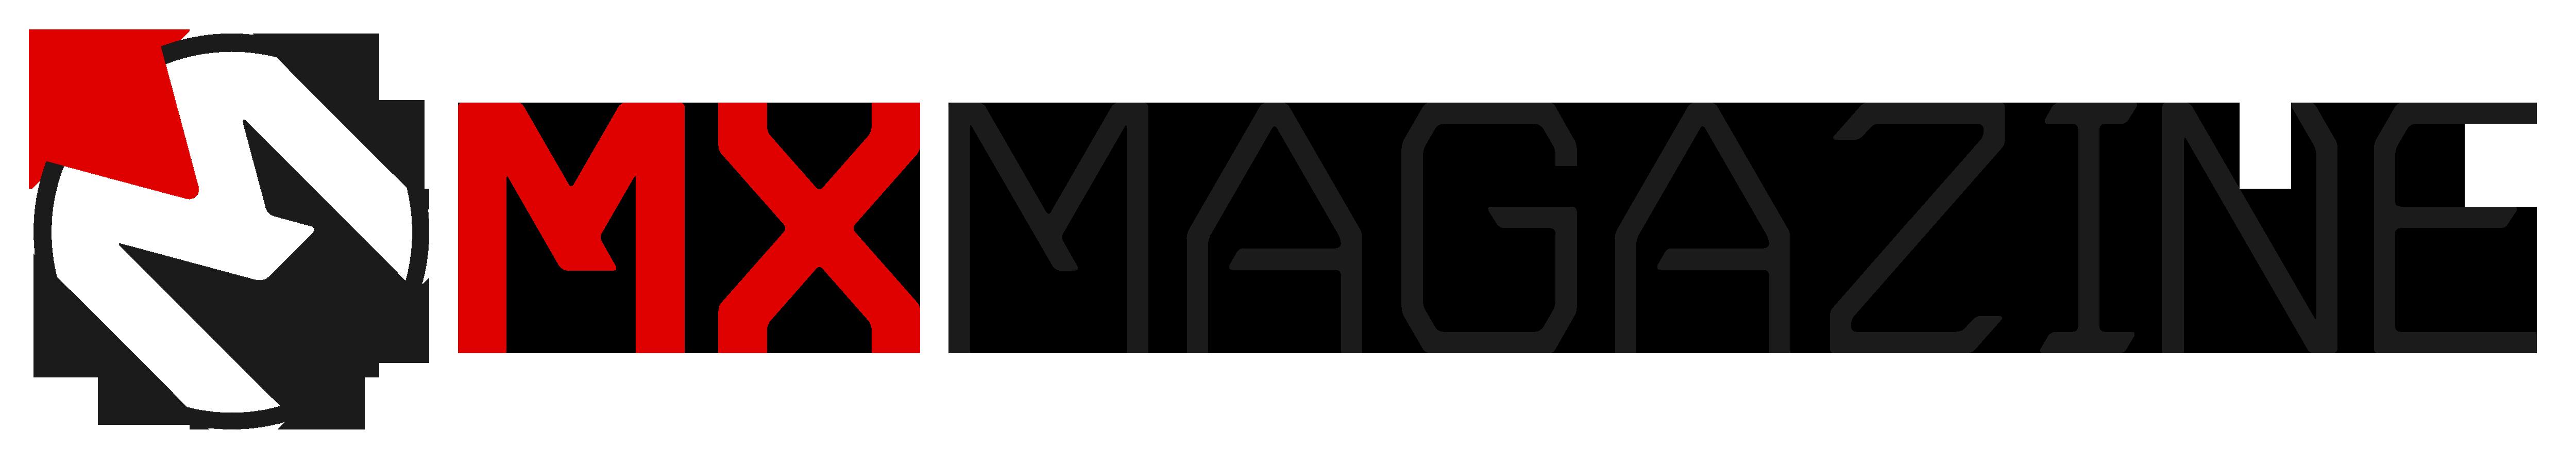 magazine_black